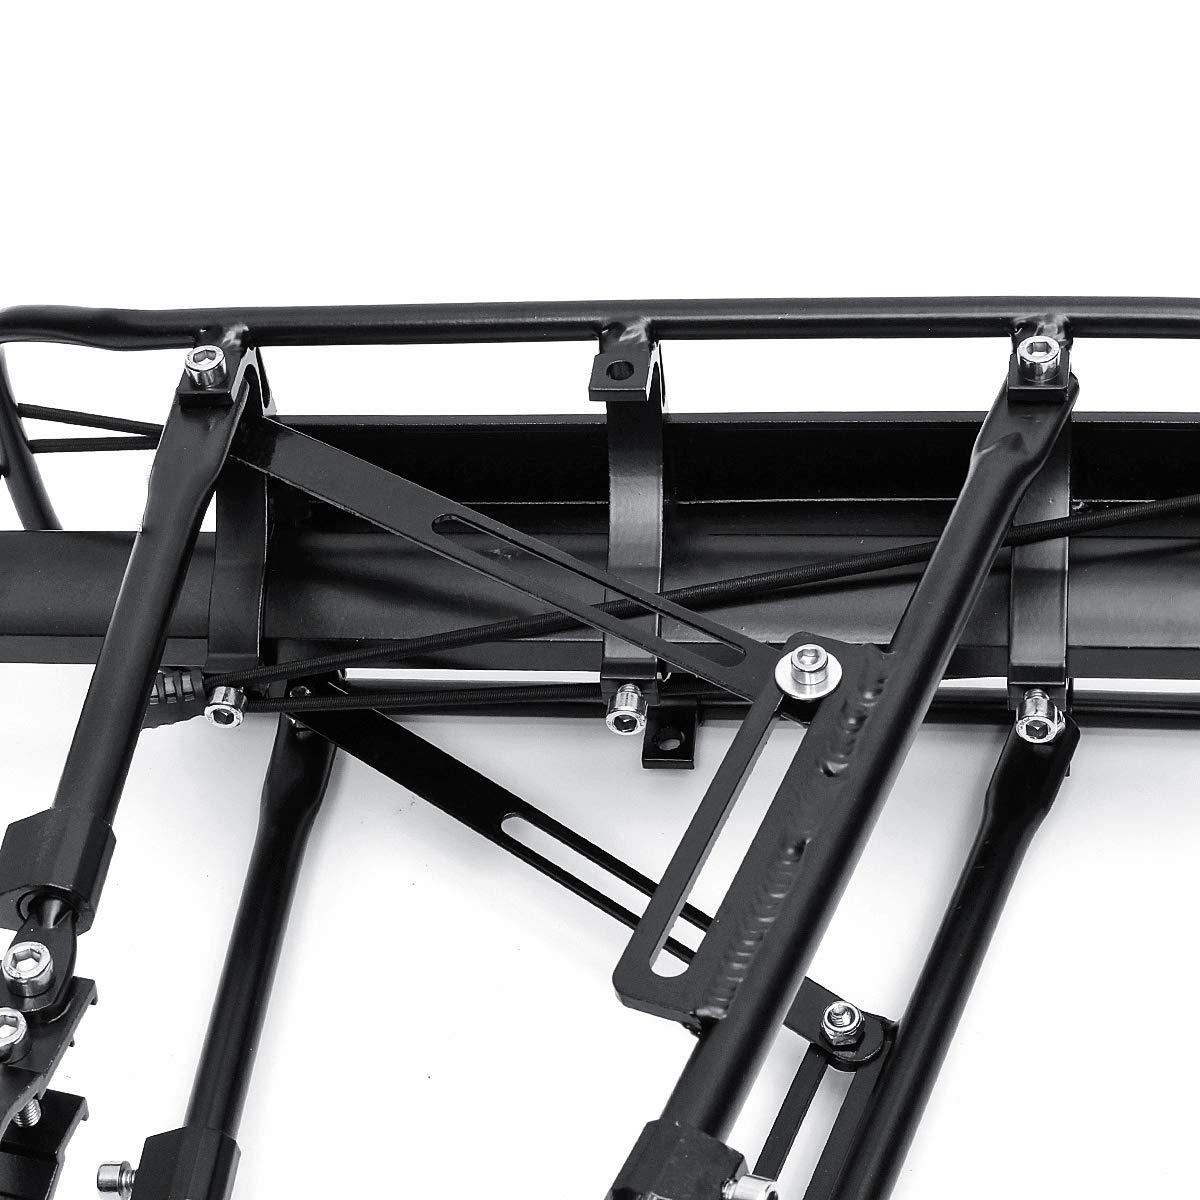 HMHRXPBQ Bicycle rear seat luggage rack transporter rack mountain bike bicycle accessories